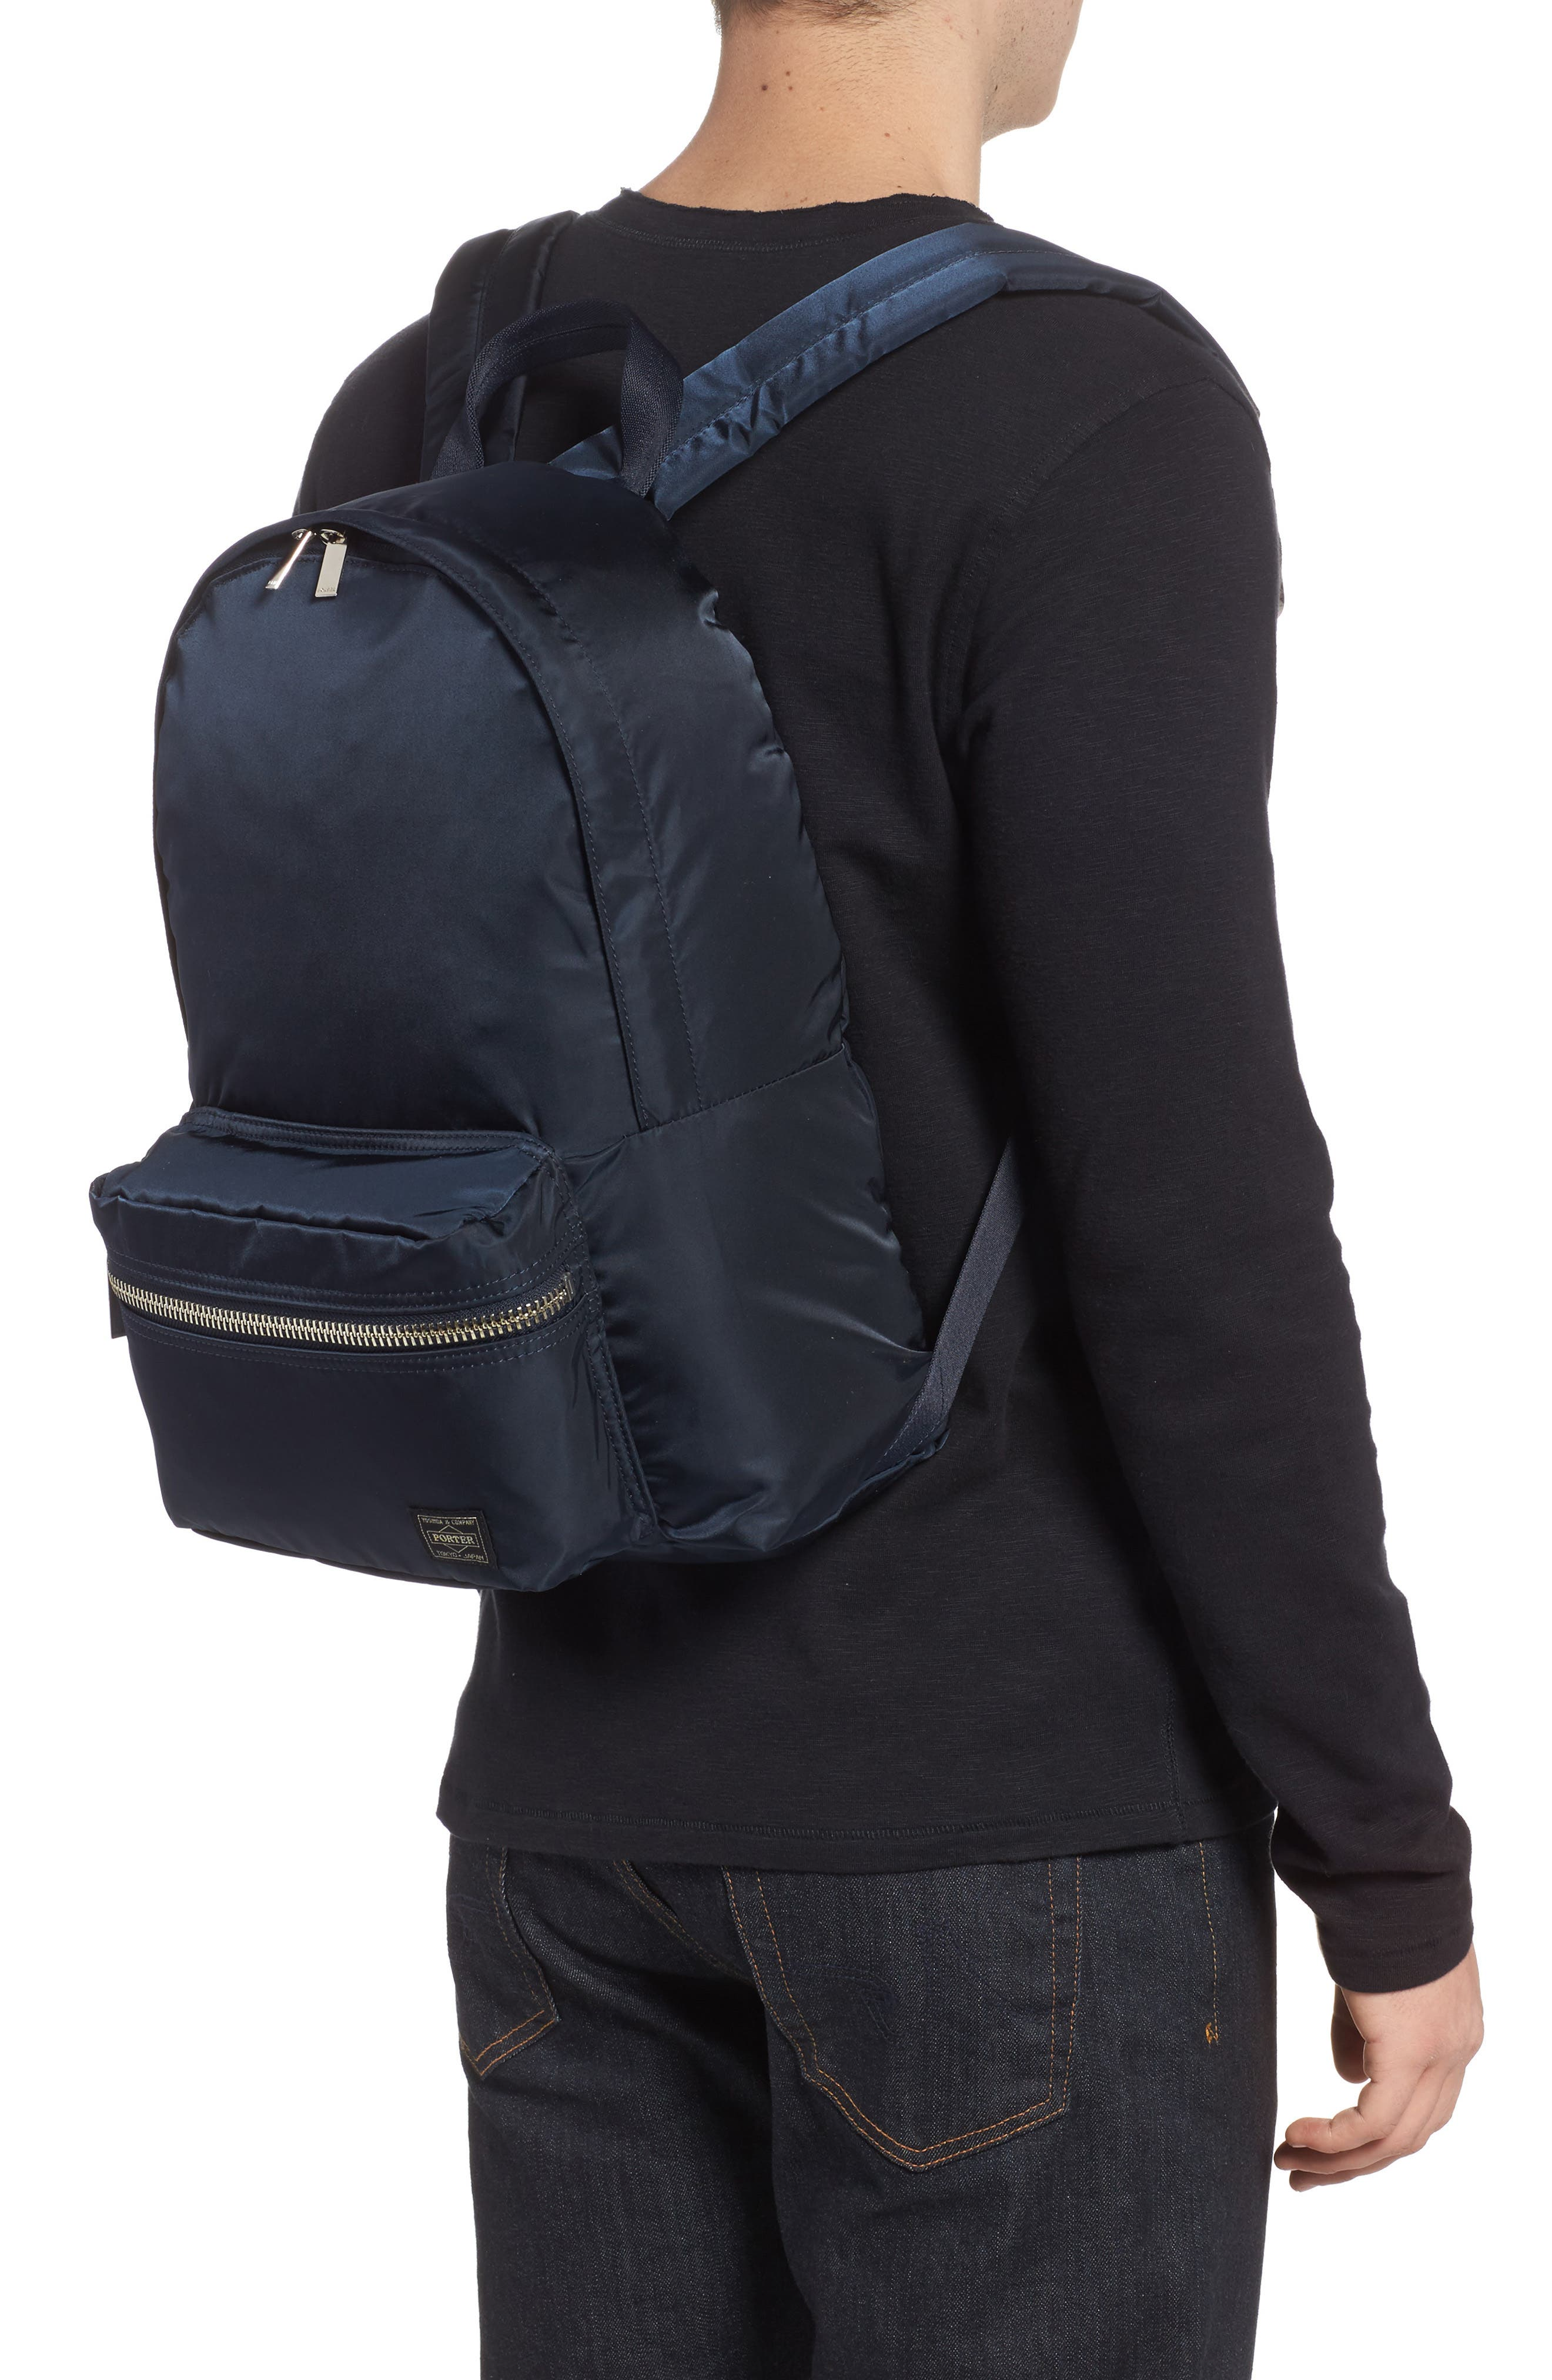 Porter-Yoshida & Co. Daily Backpack,                             Alternate thumbnail 2, color,                             Navy